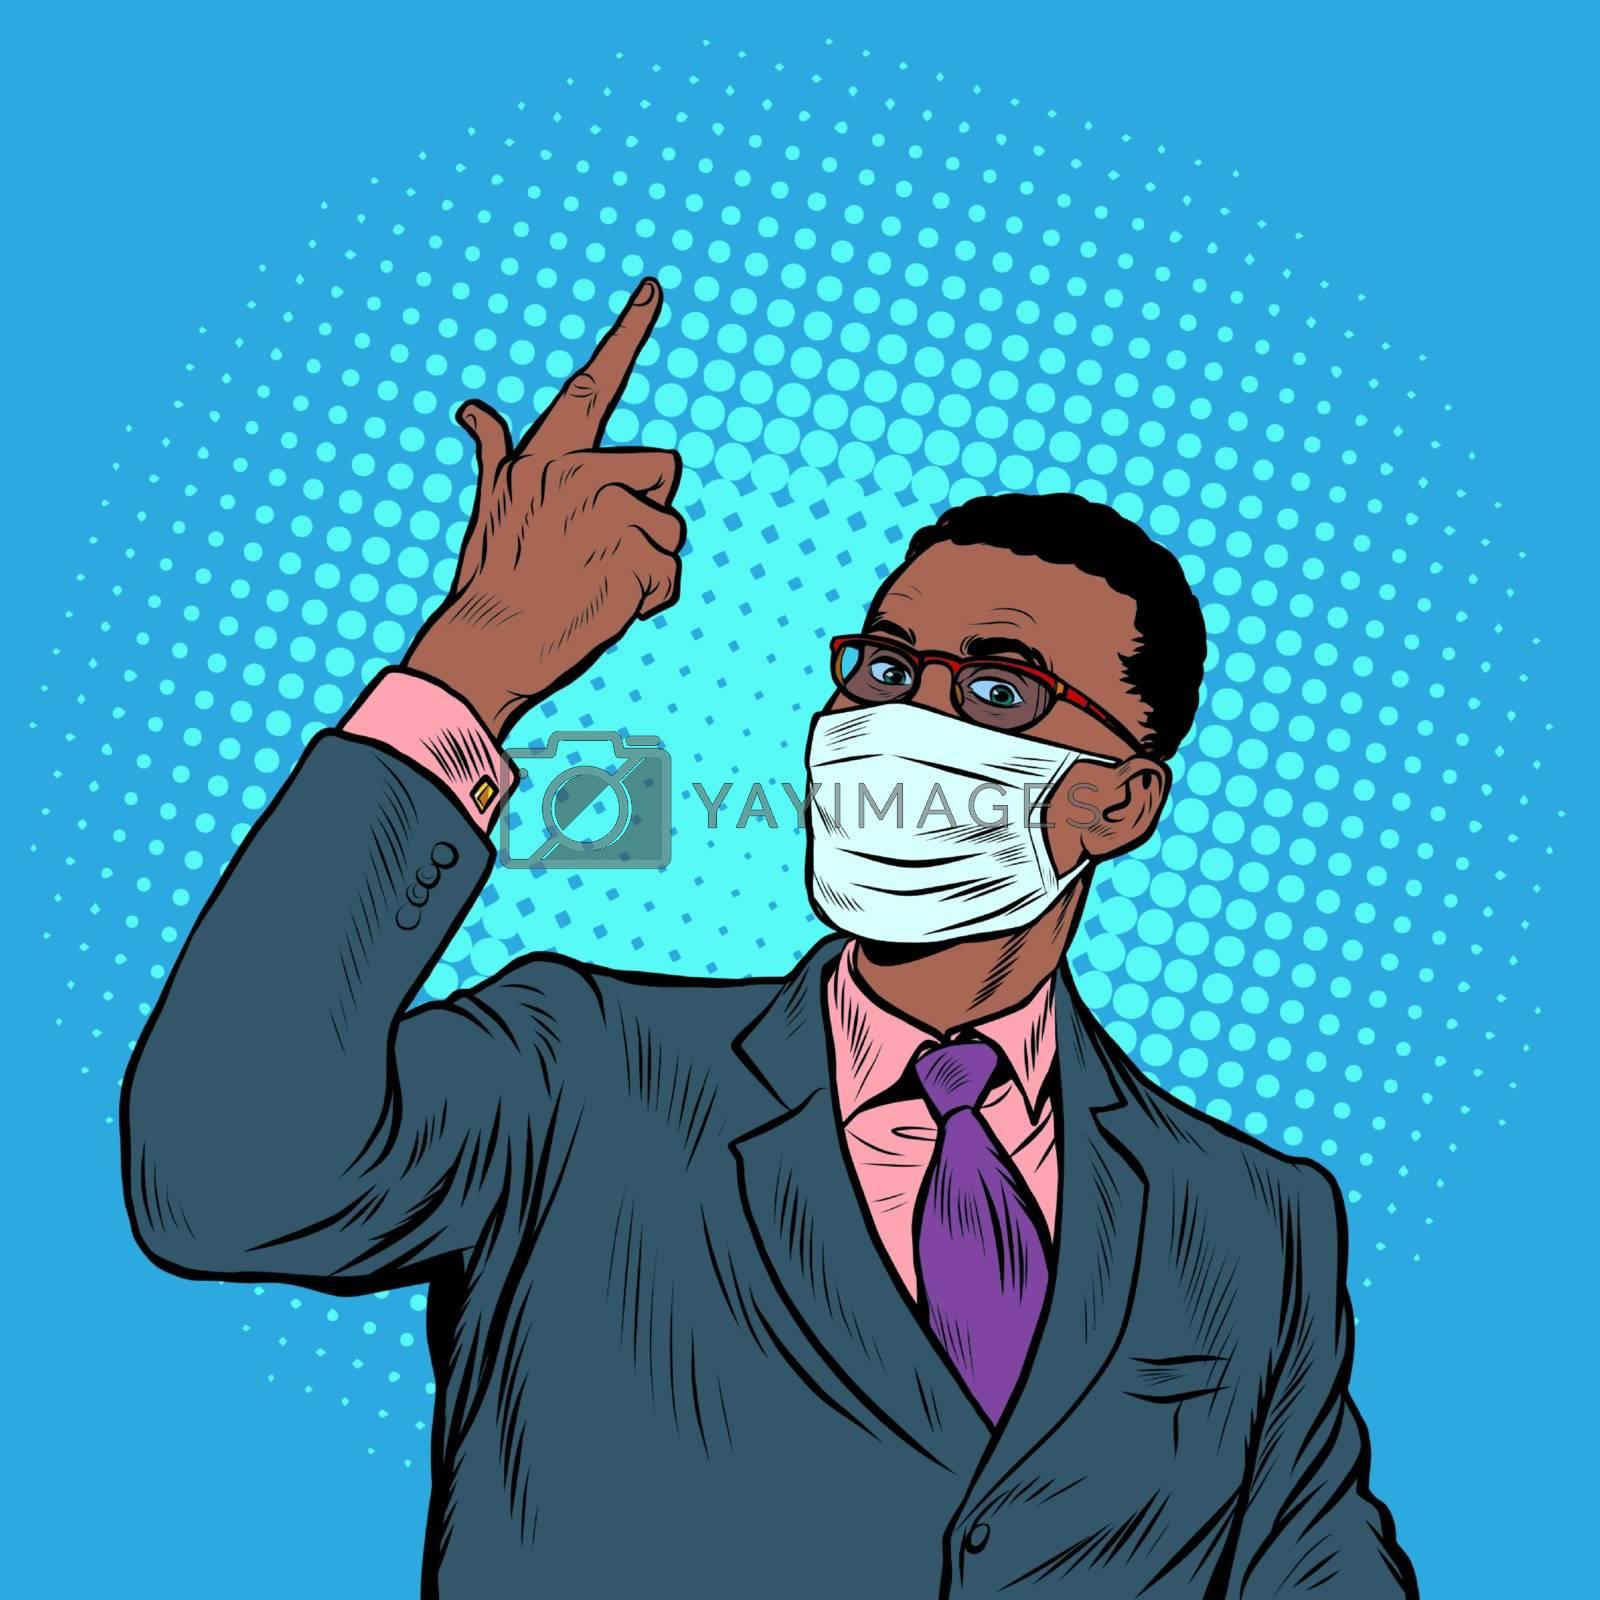 African businessman in a medical mask. Coronavirus epidemic. Self isolation and quarantine. Pop art retro vector illustration vintage kitsch 50s 60s style